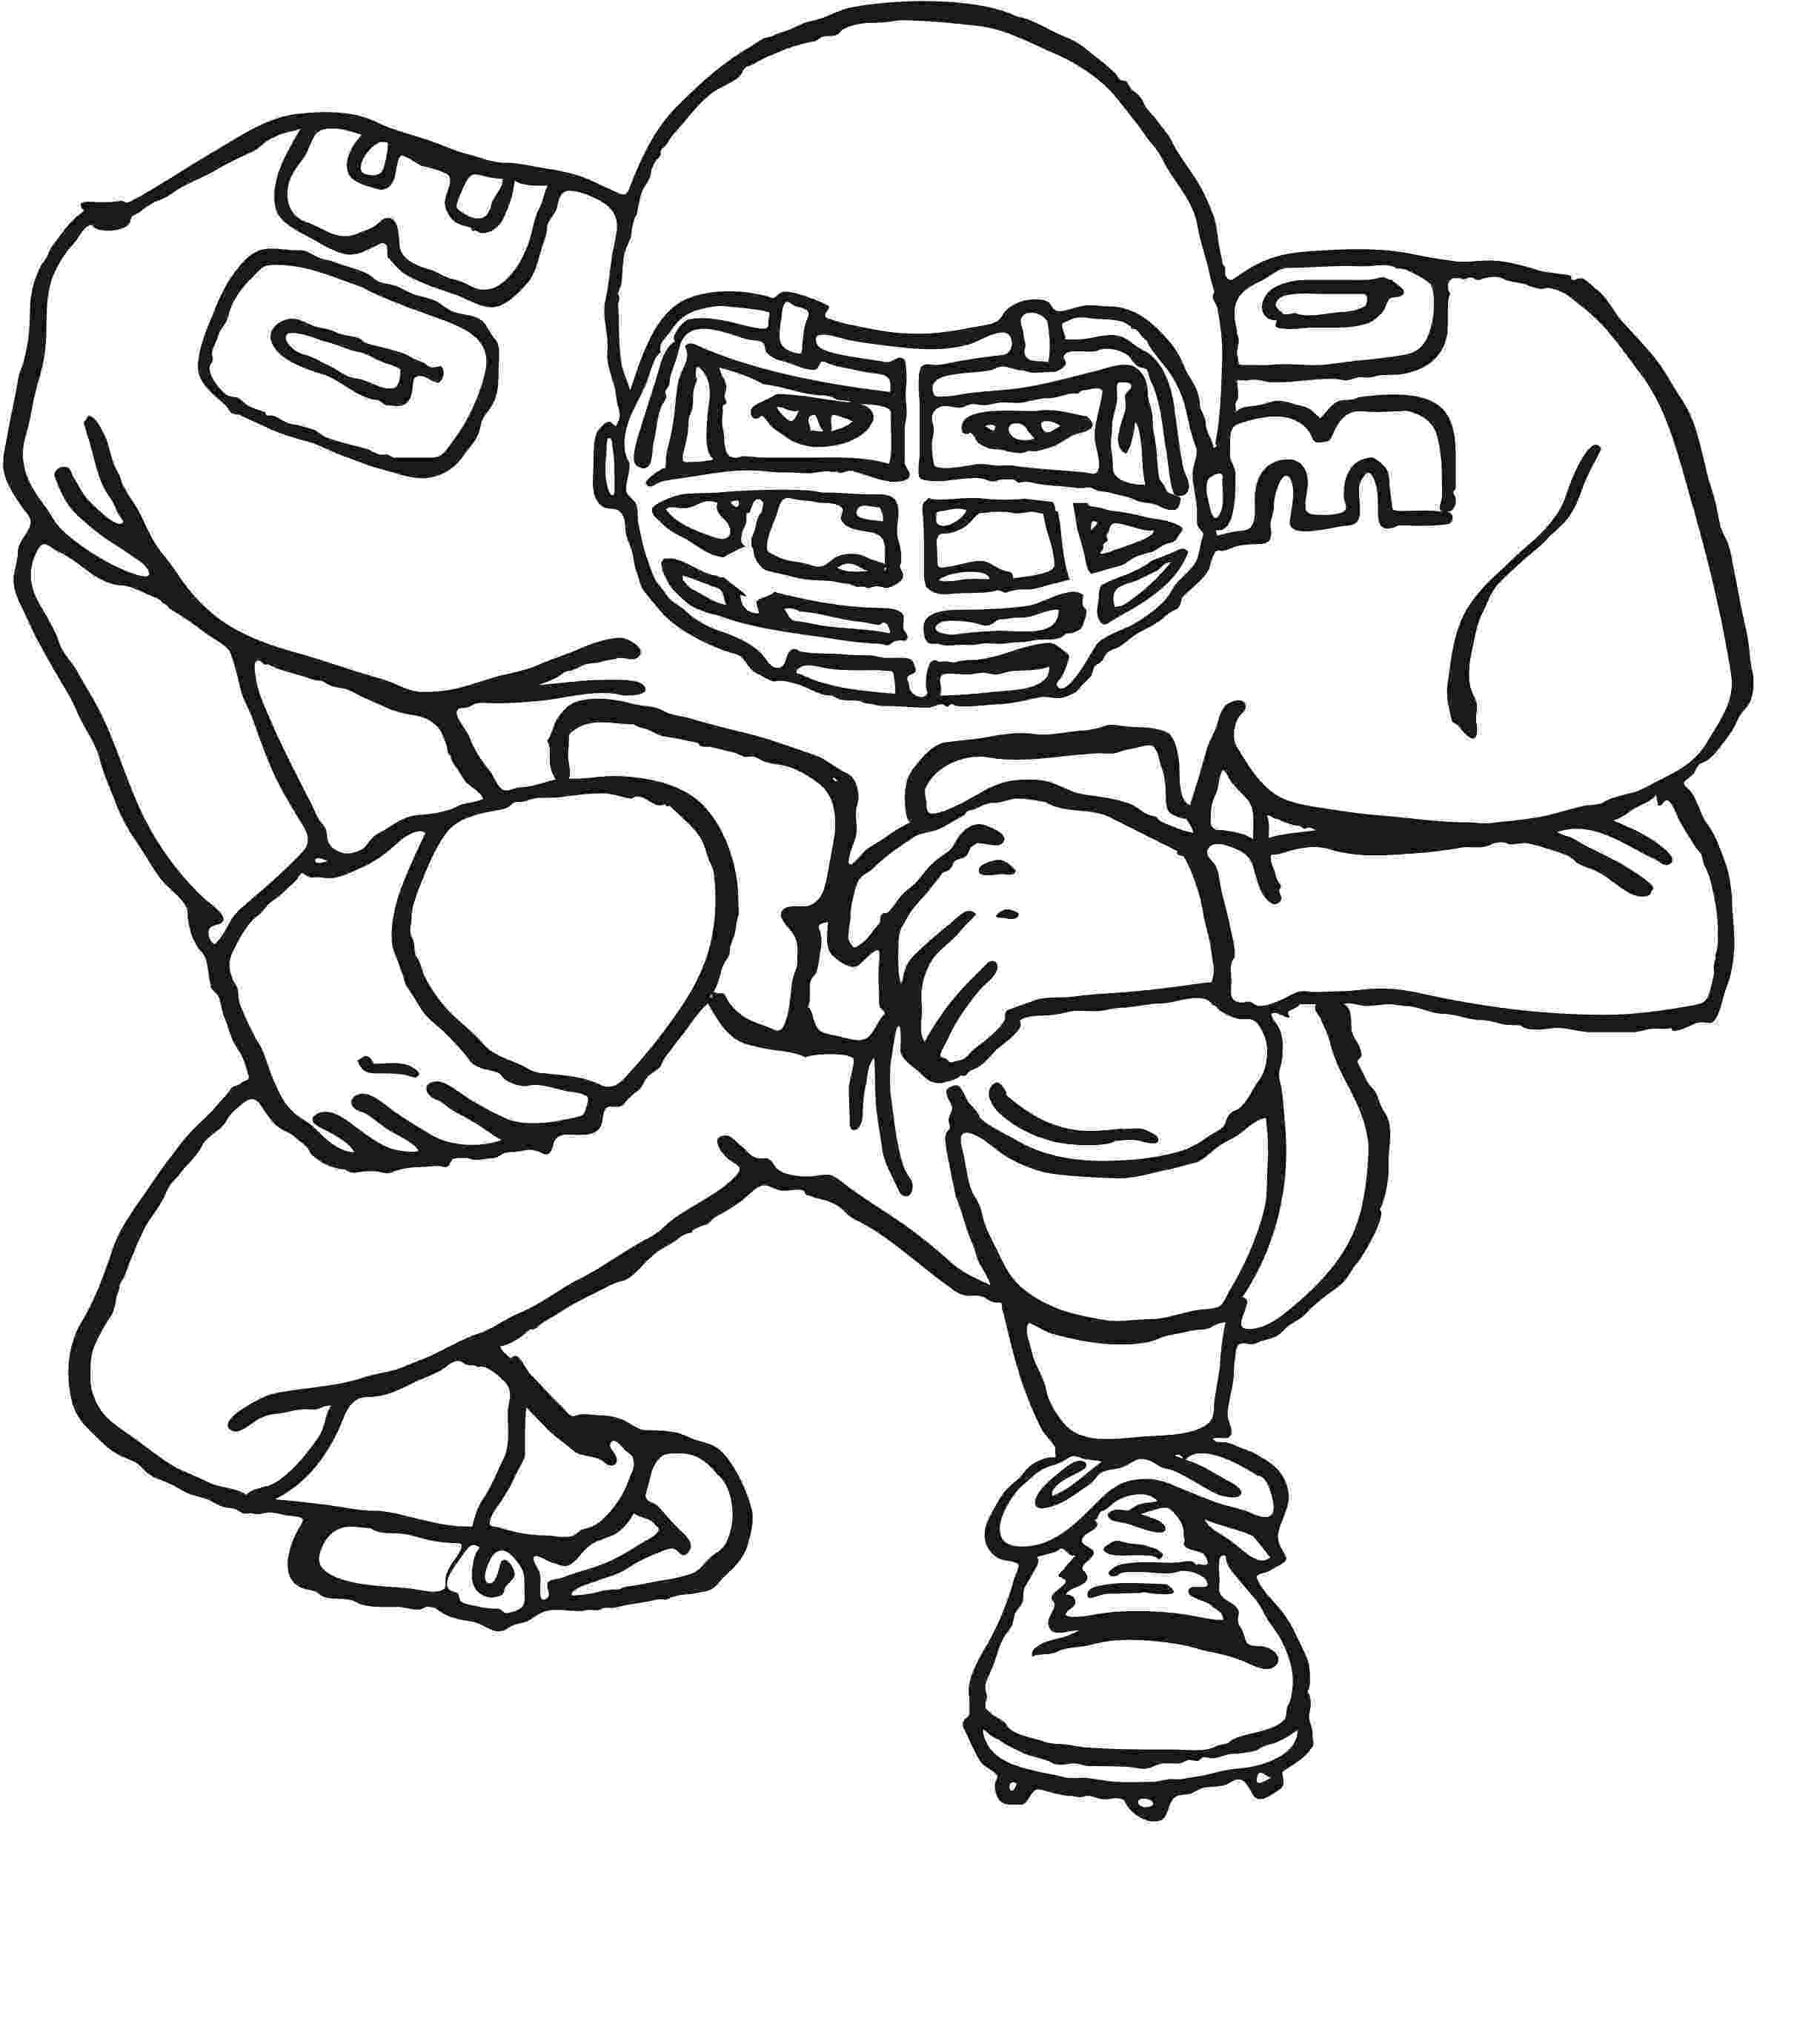 football coloring page free printable football coloring pages for kids best page coloring football